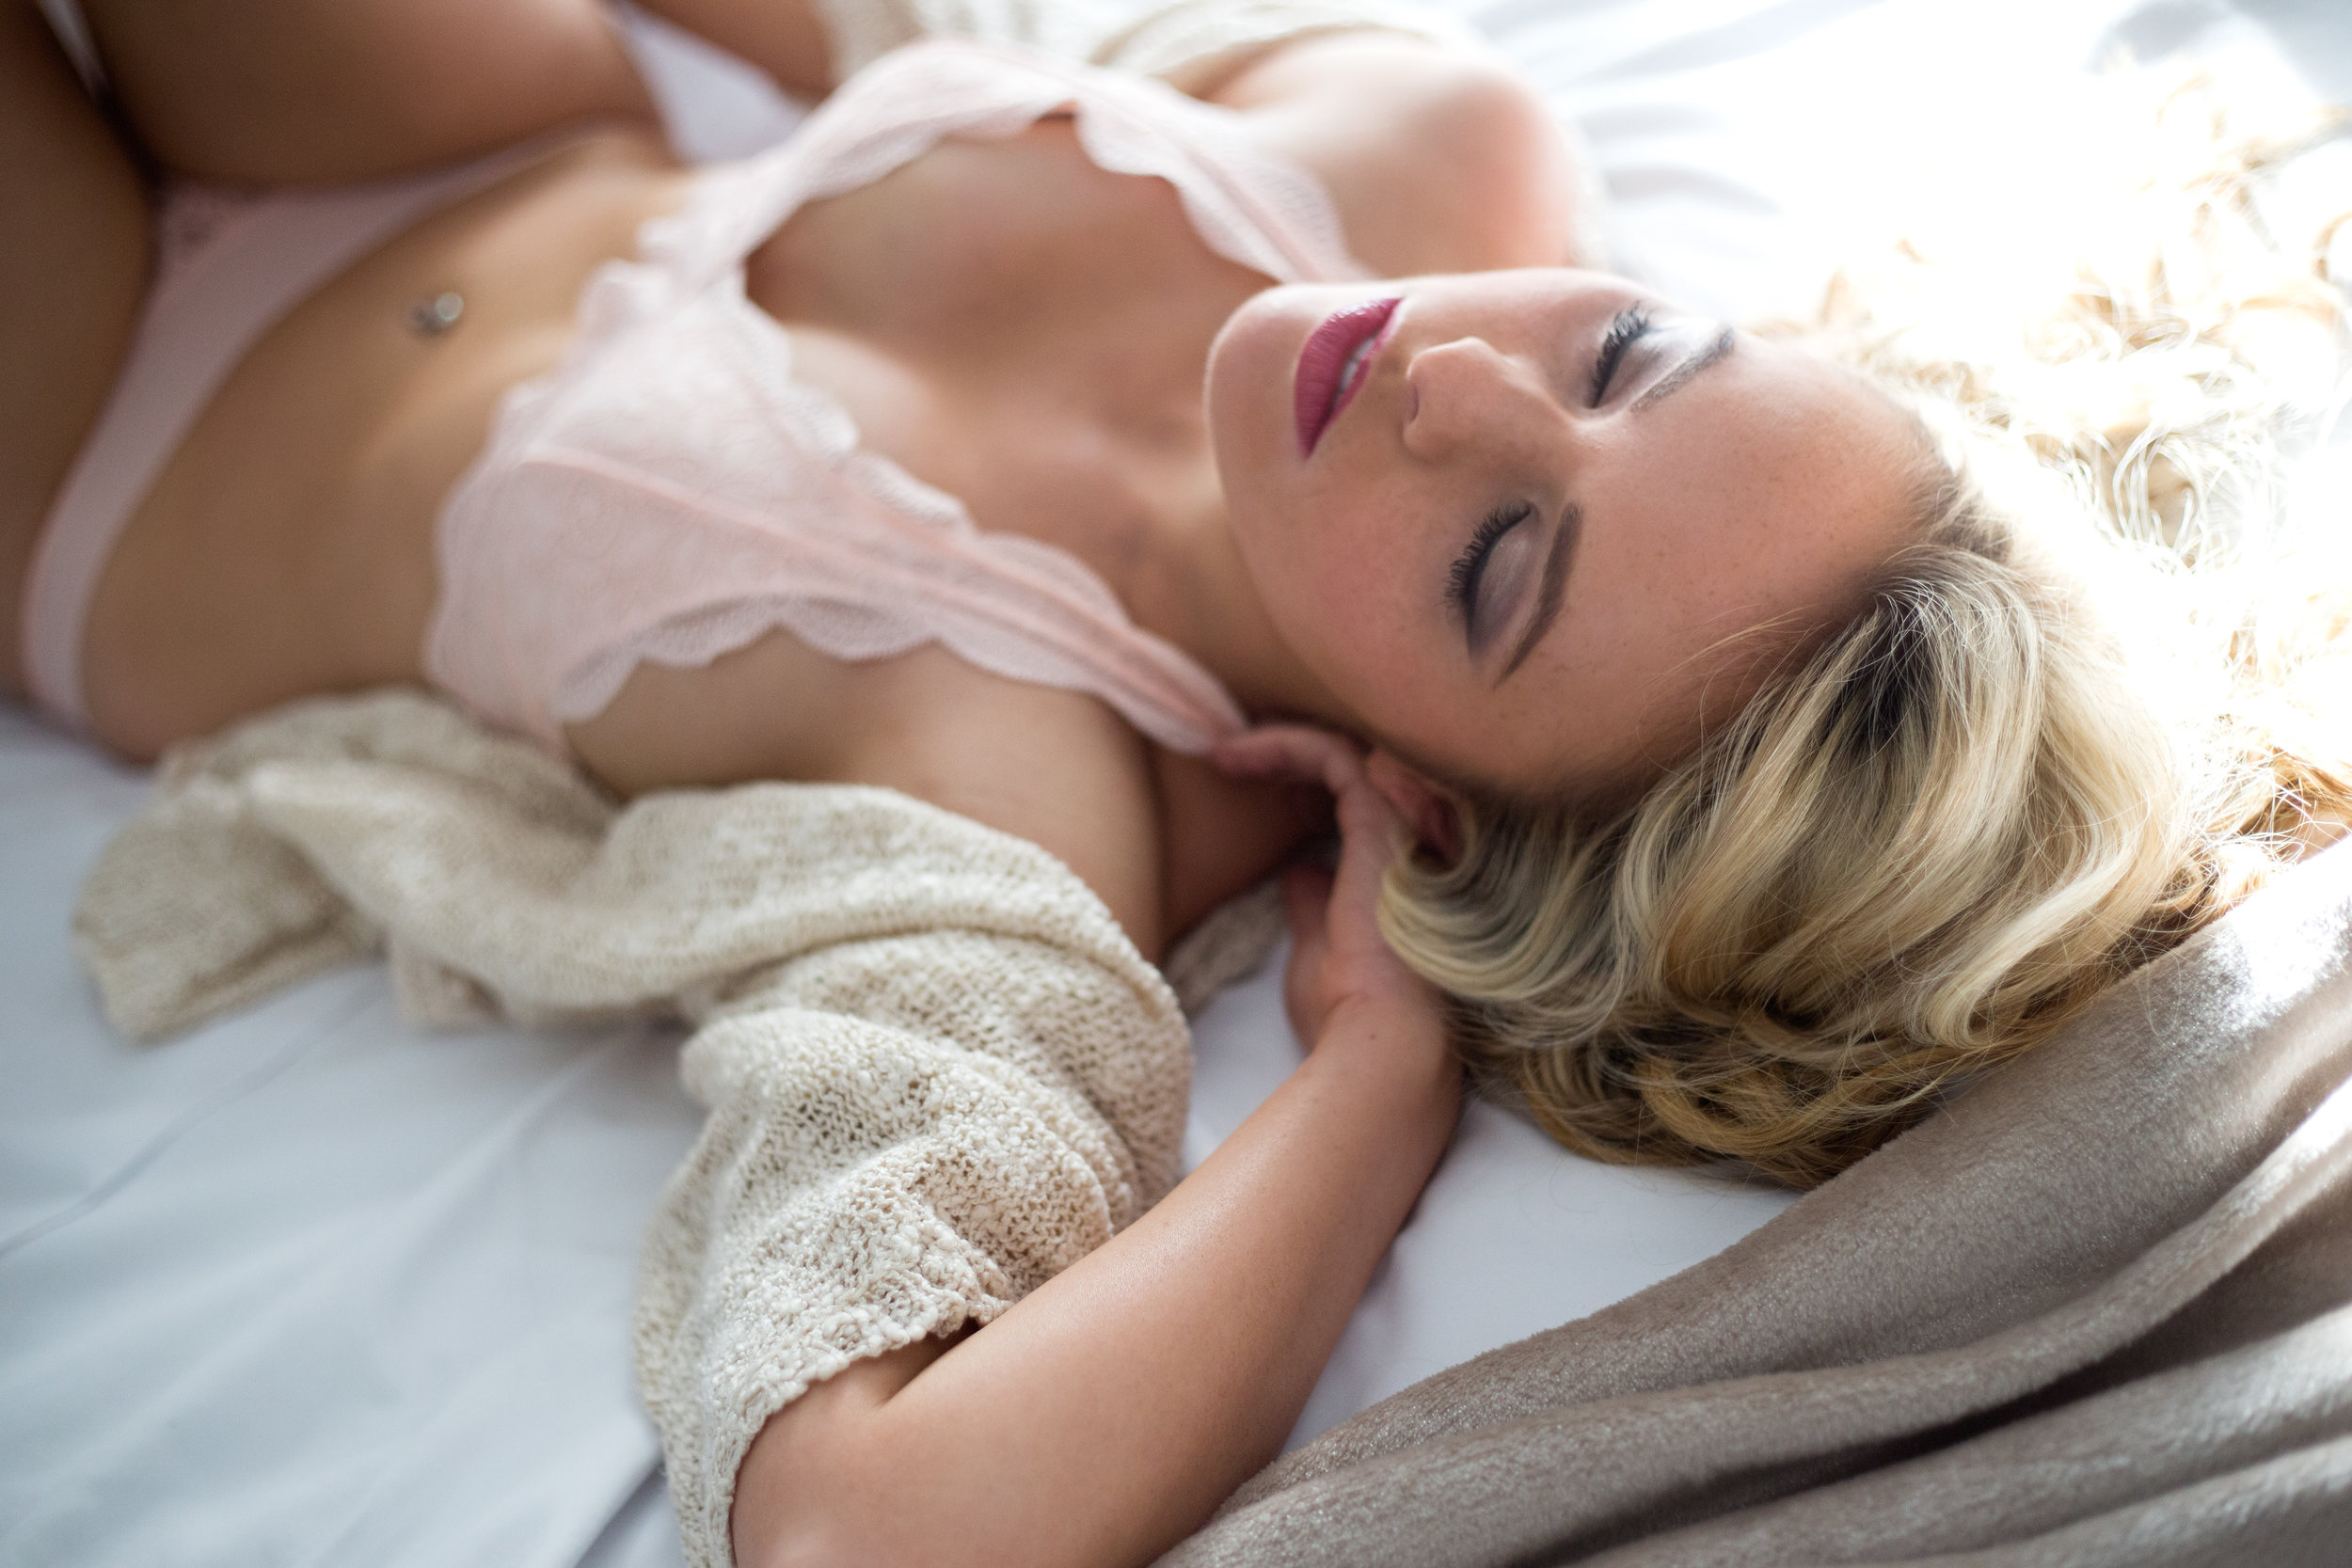 modest boudoir Columbus Ohio, classy, classic, flirty girl next door, sweater boudoir